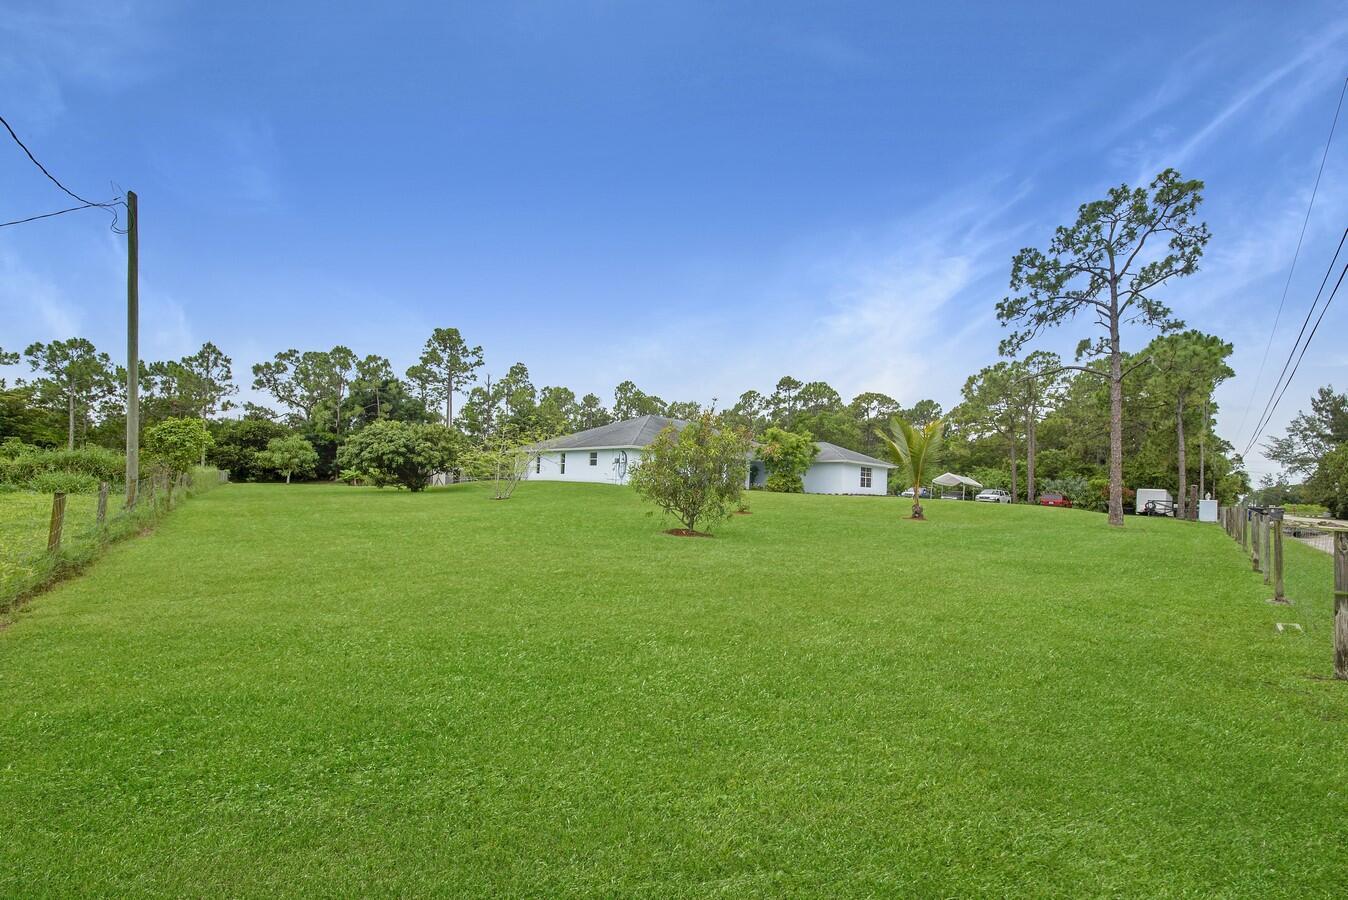 12904 61st Street The Acreage, FL 33412 photo 54